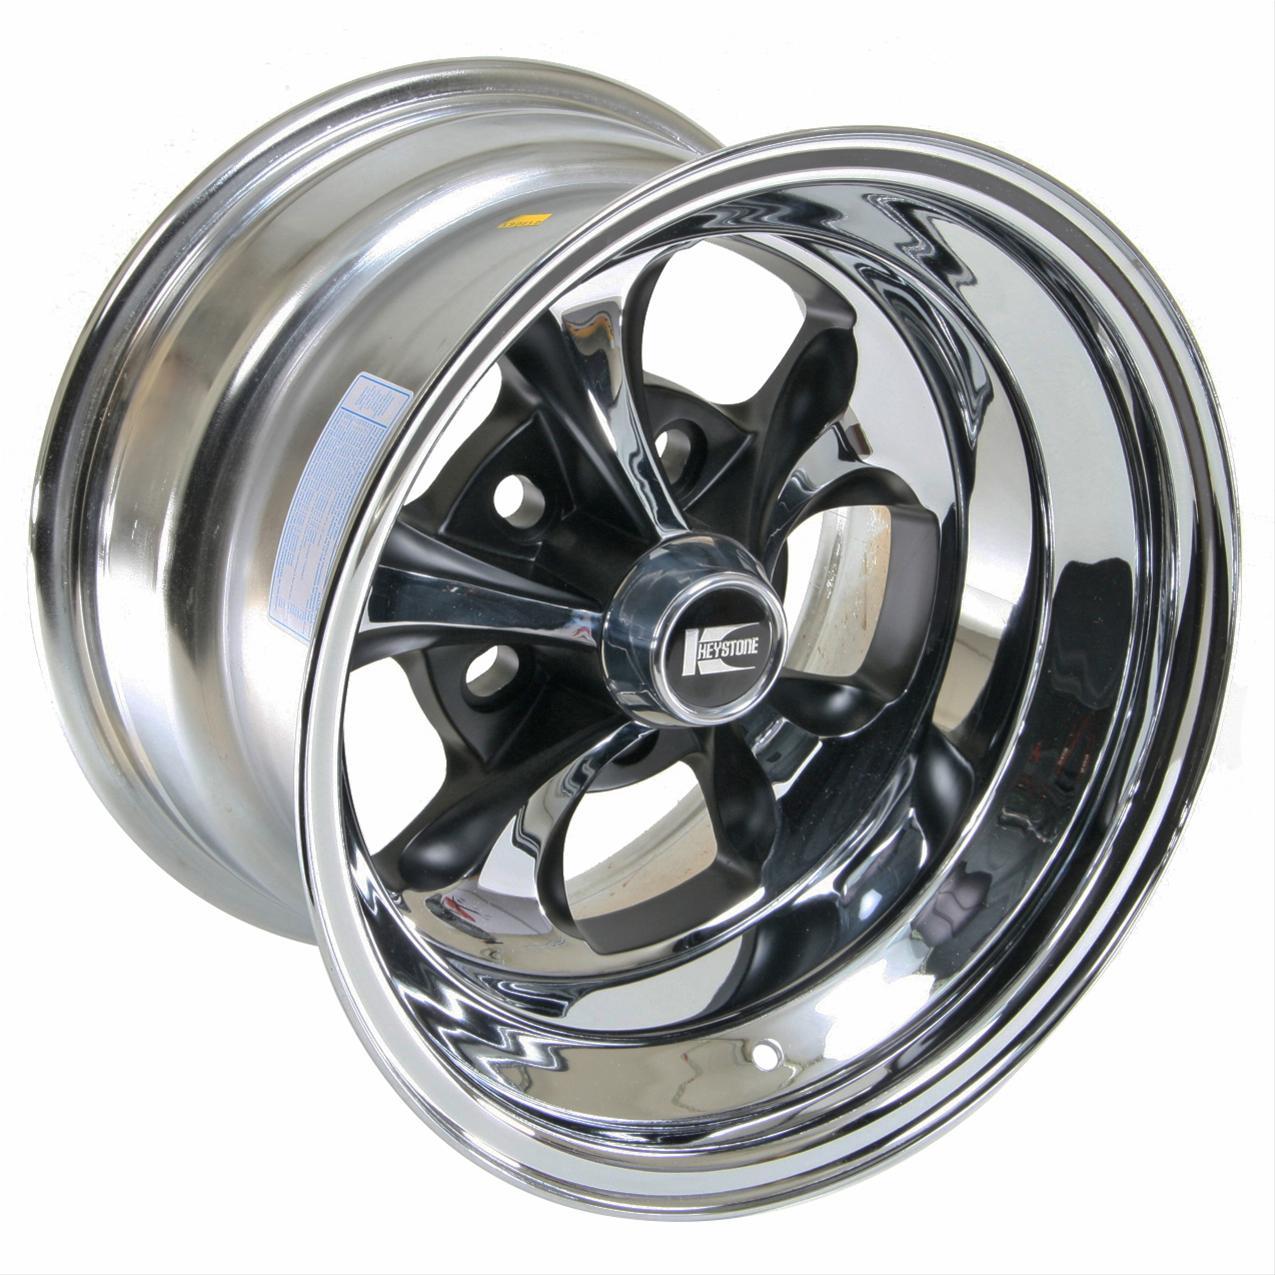 Cragar Chrome Keystone Klassic Wheels 325199 Free